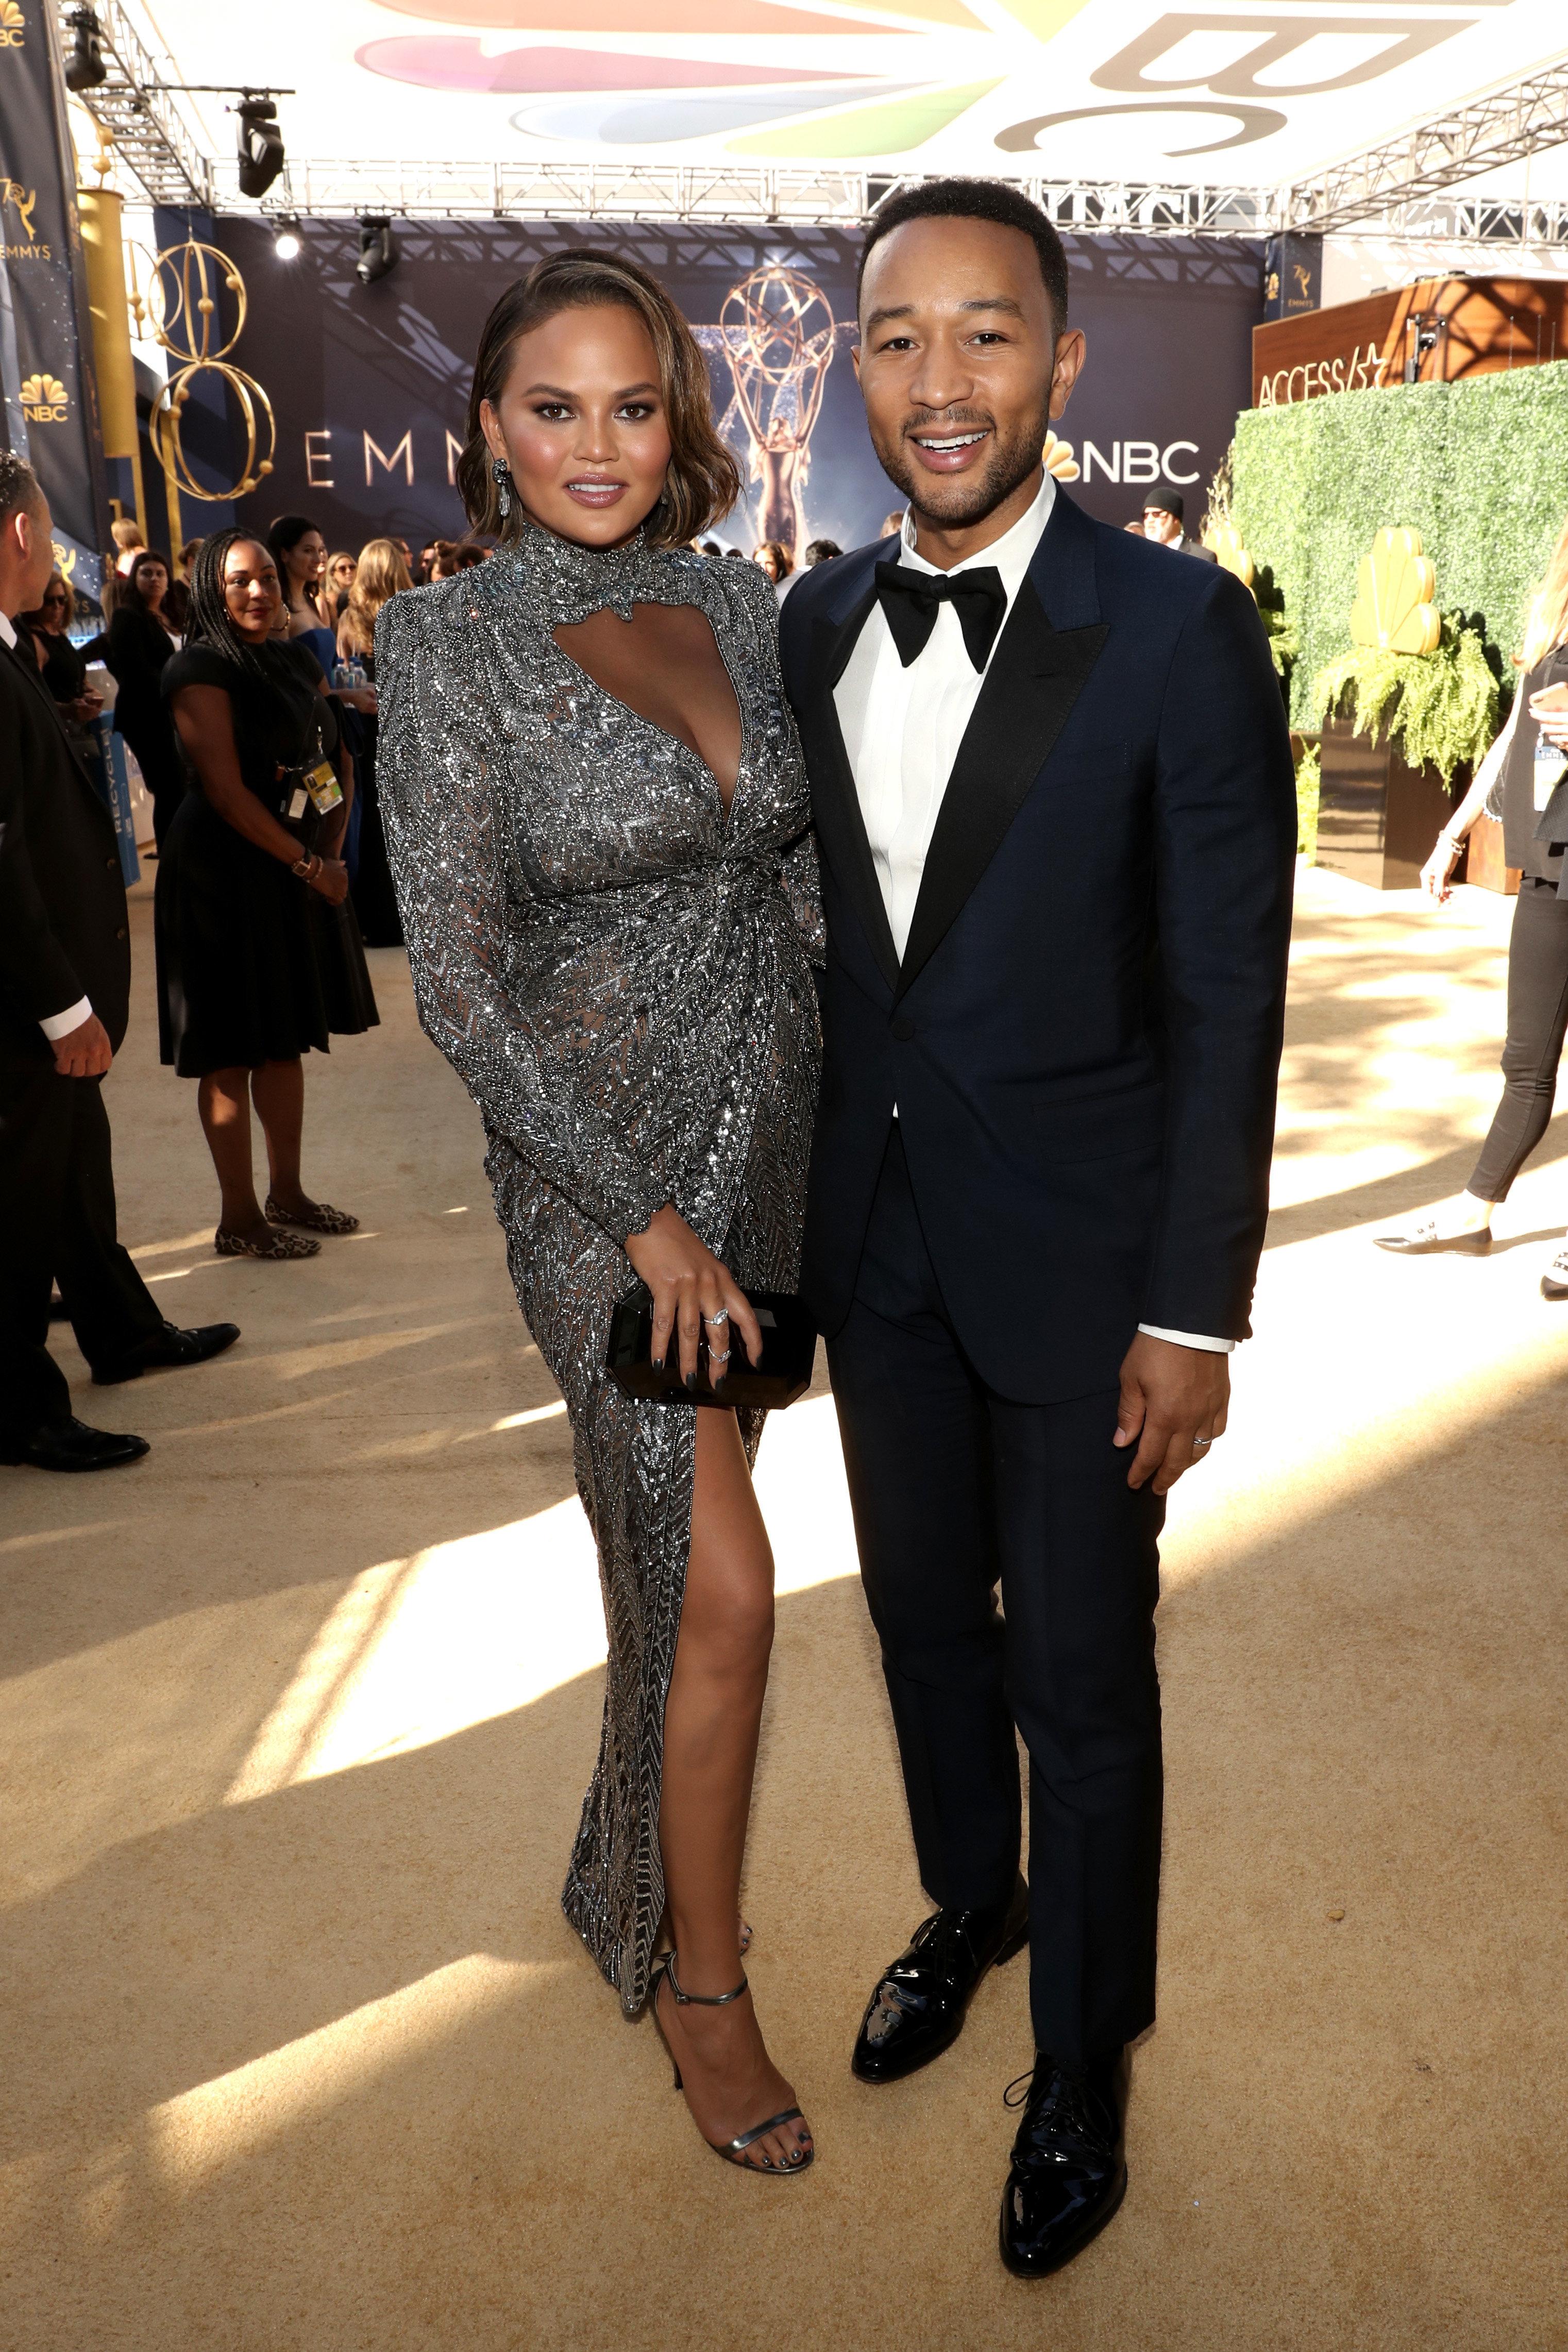 Chrissy Teigen and actor/singer John Legend arrive to the 70th Annual Primetime Emmy Awards.